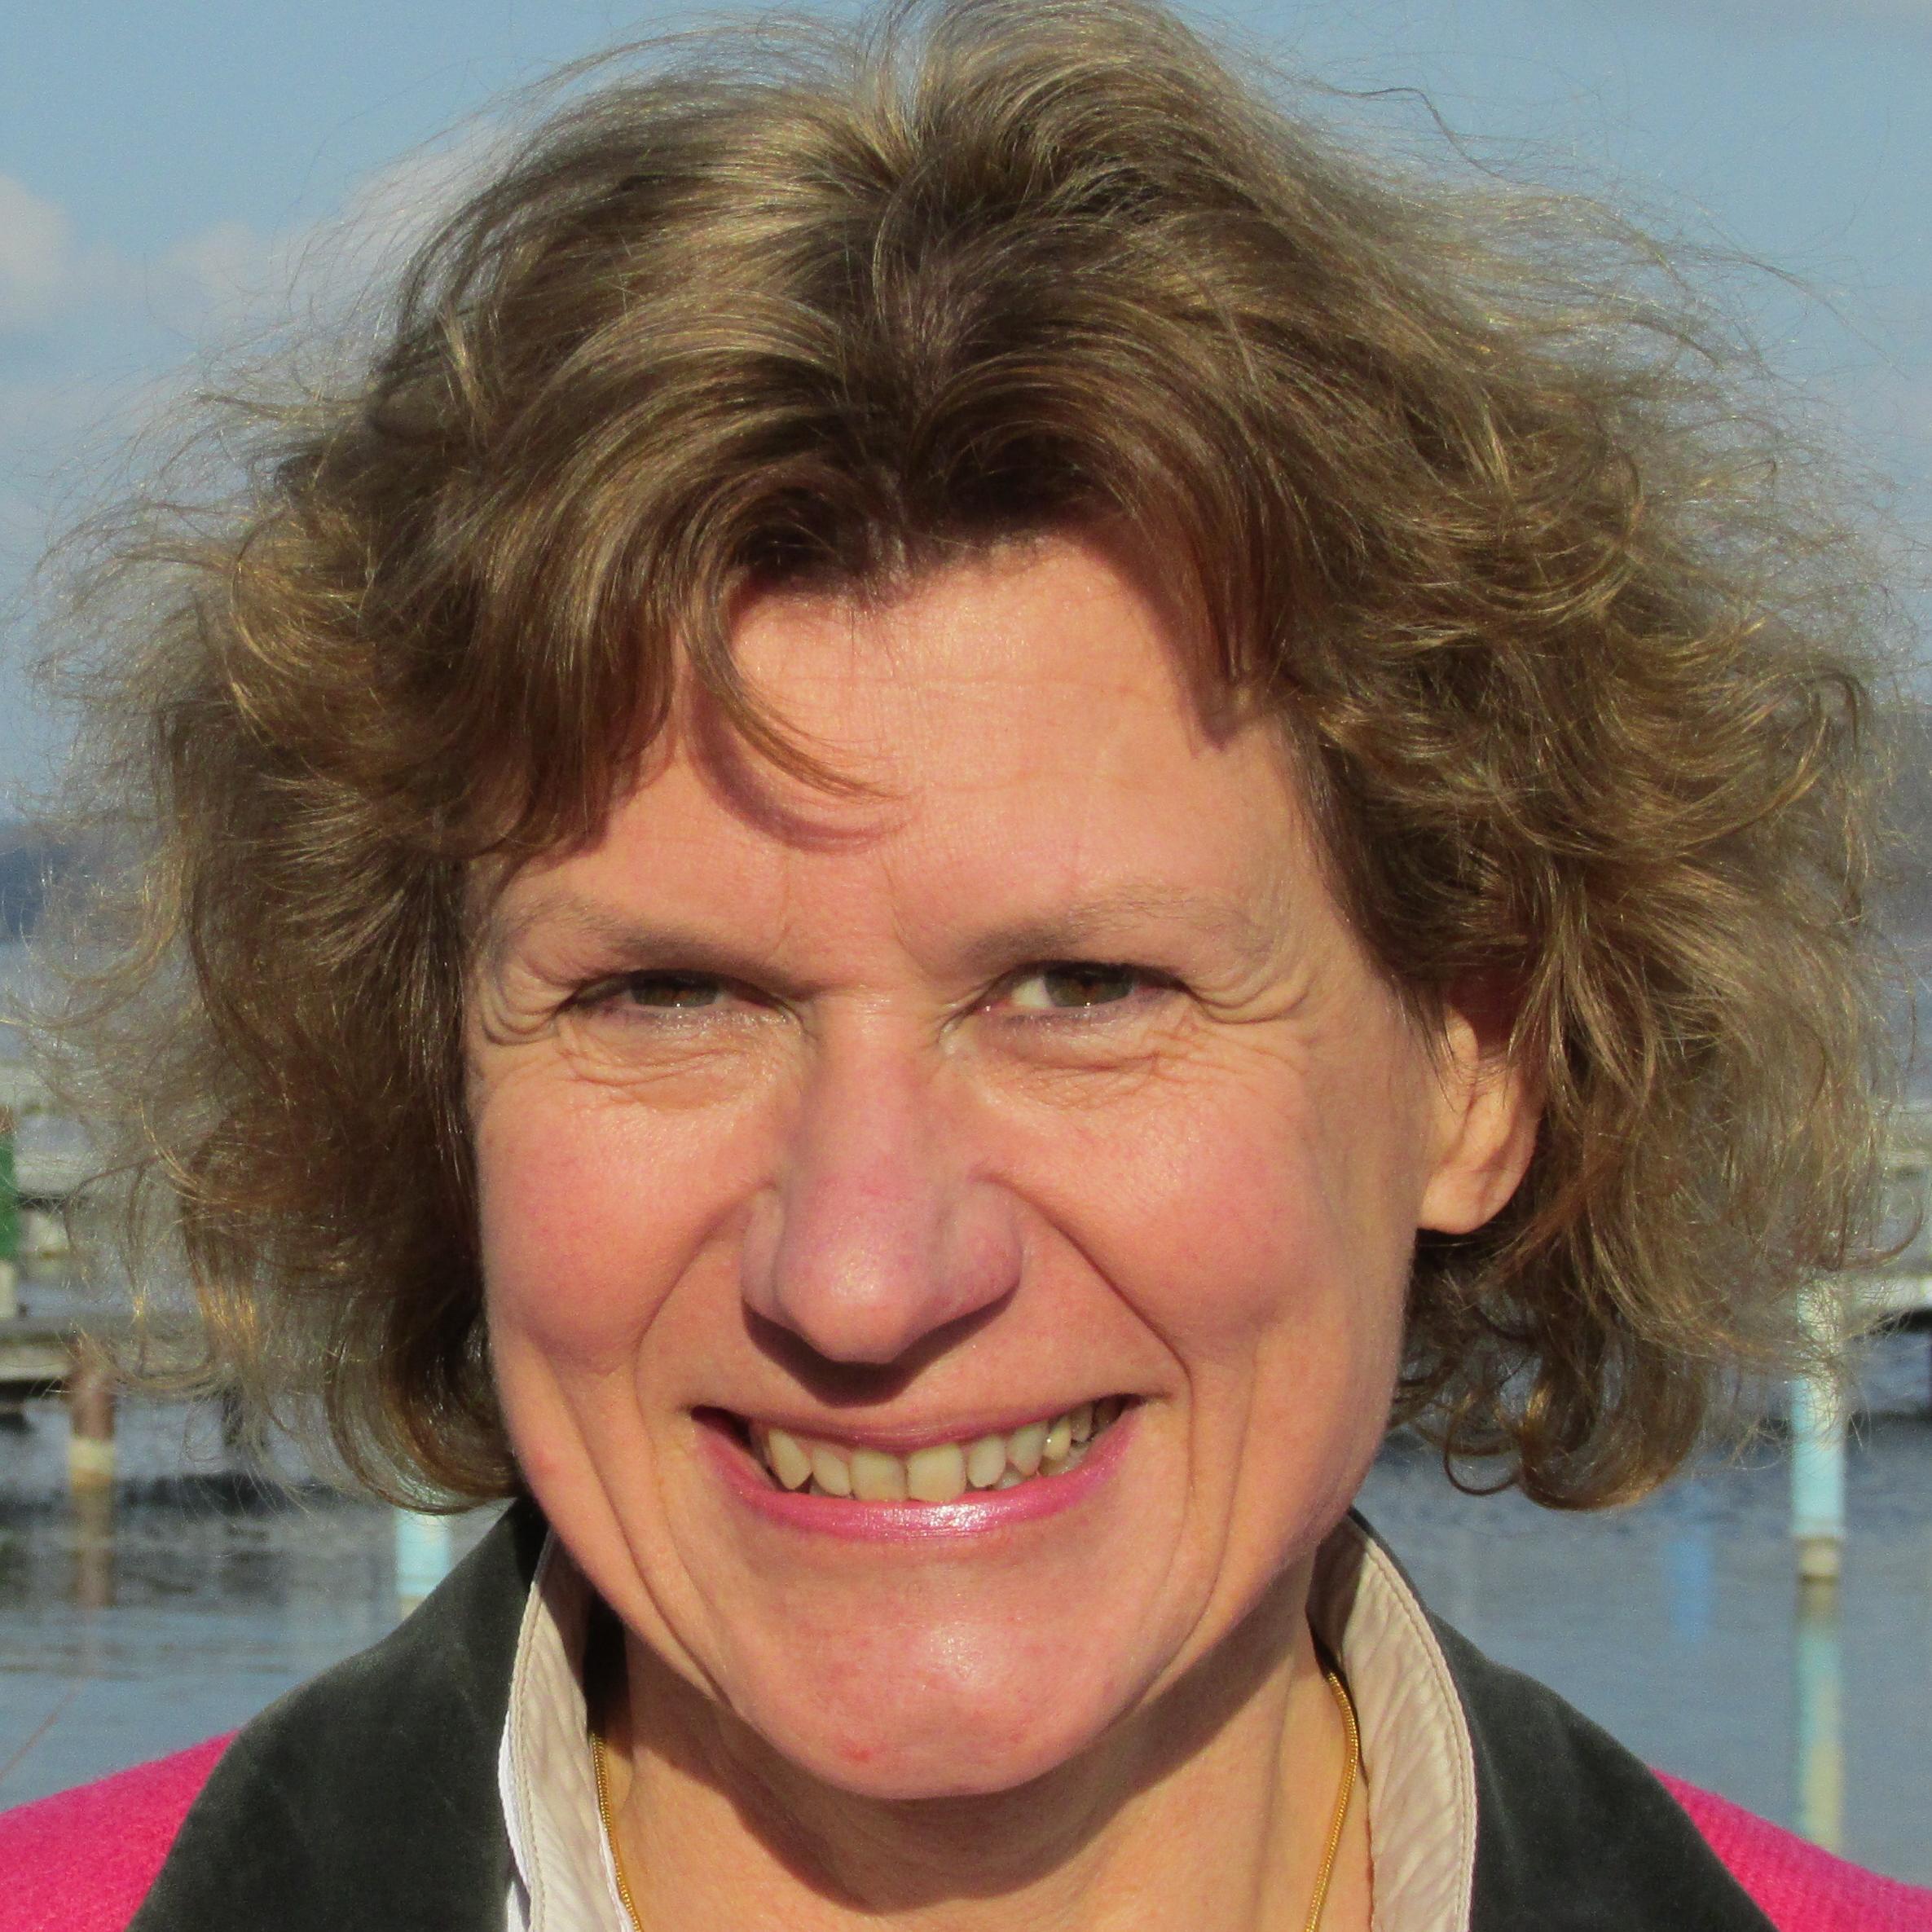 Andrea Kammhuber